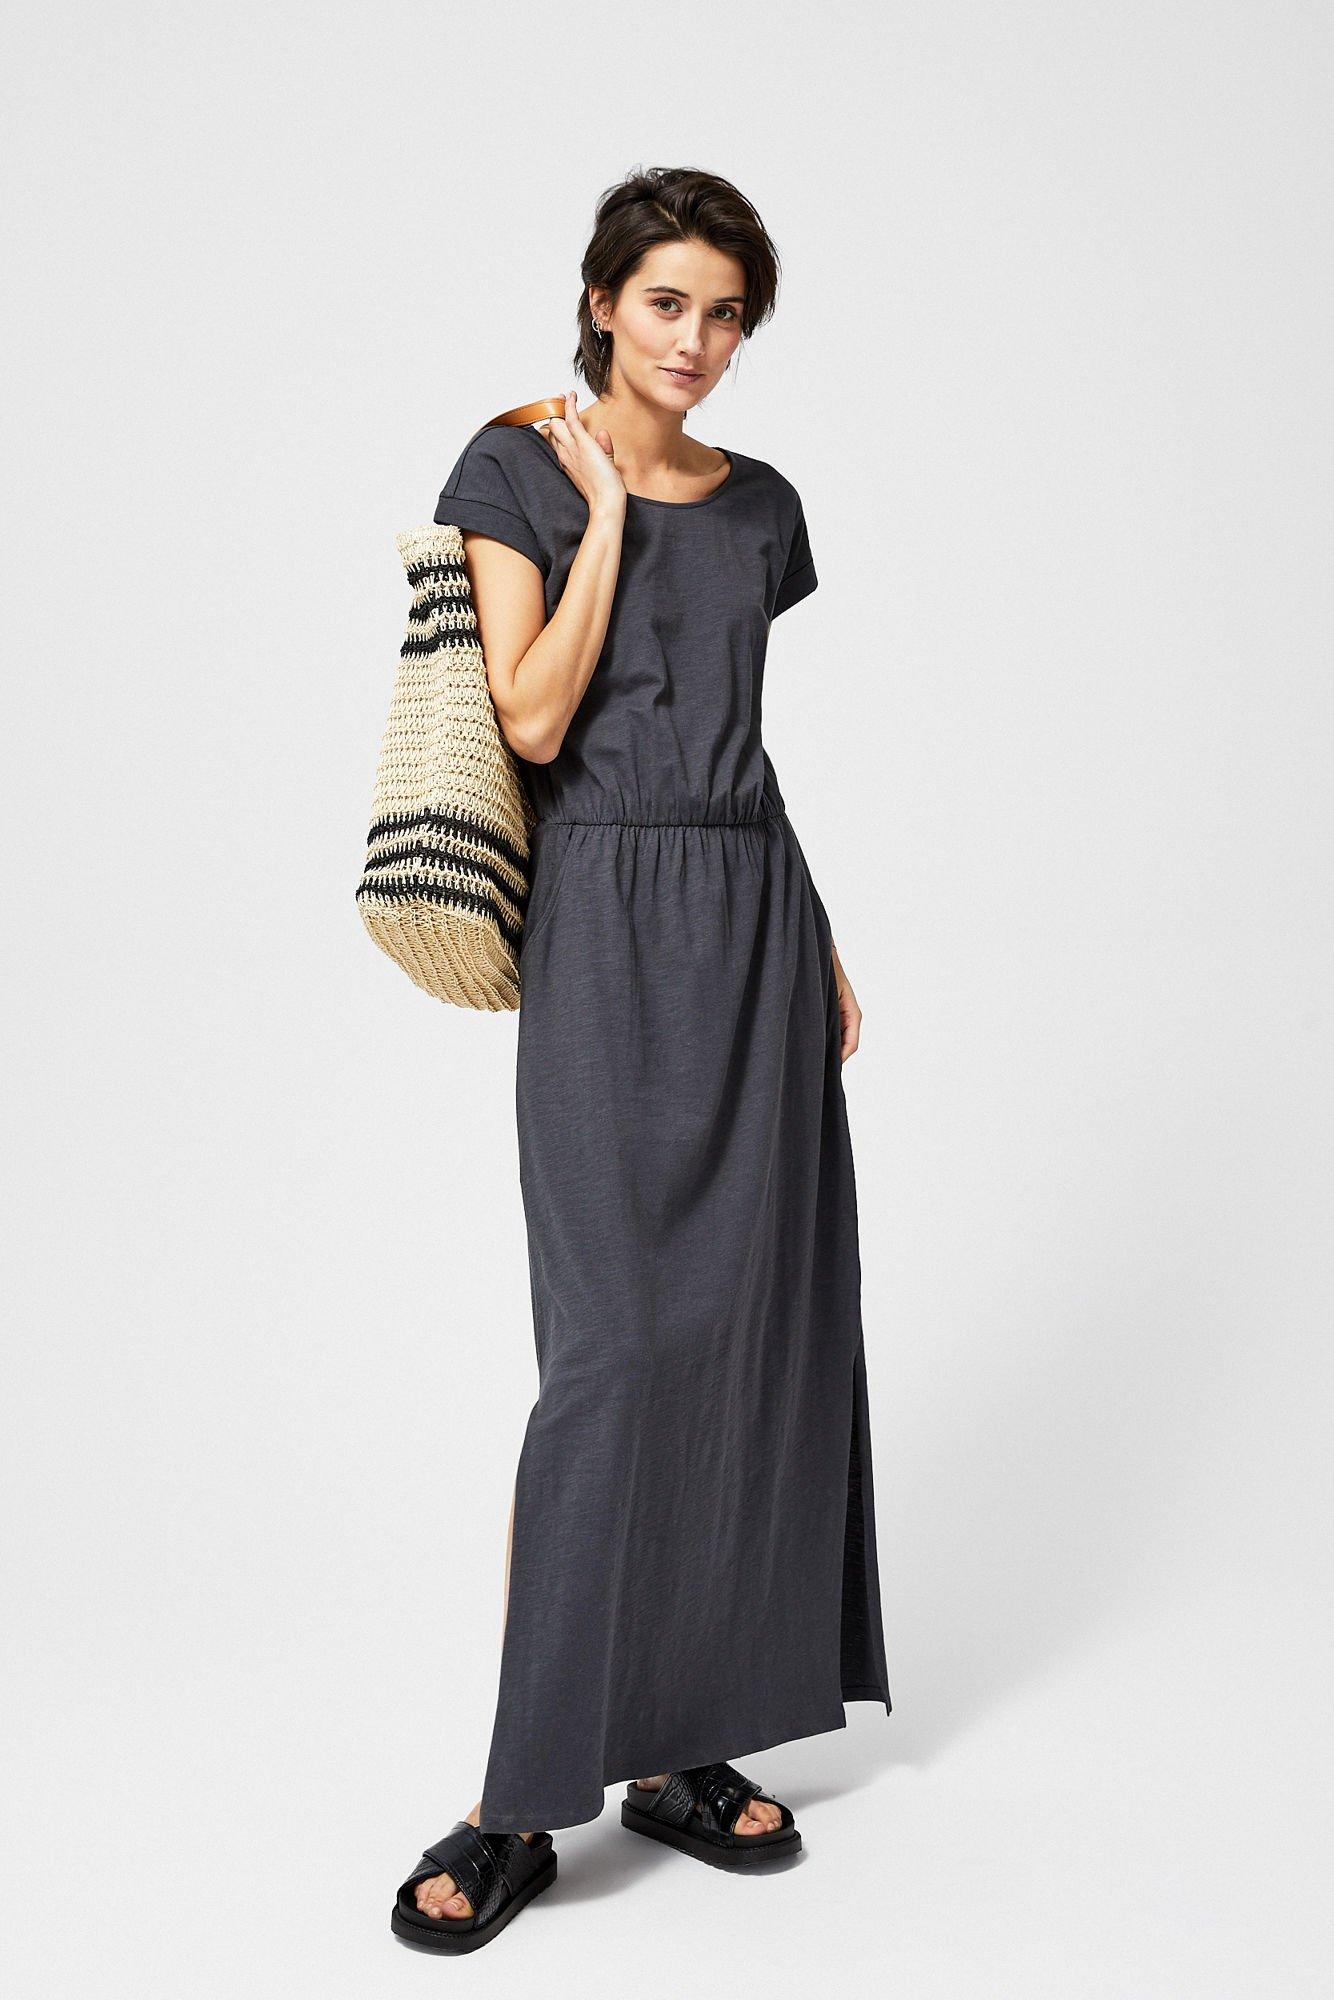 5553bfbcf3 ... Sukienka bawełniana typu maxi ...